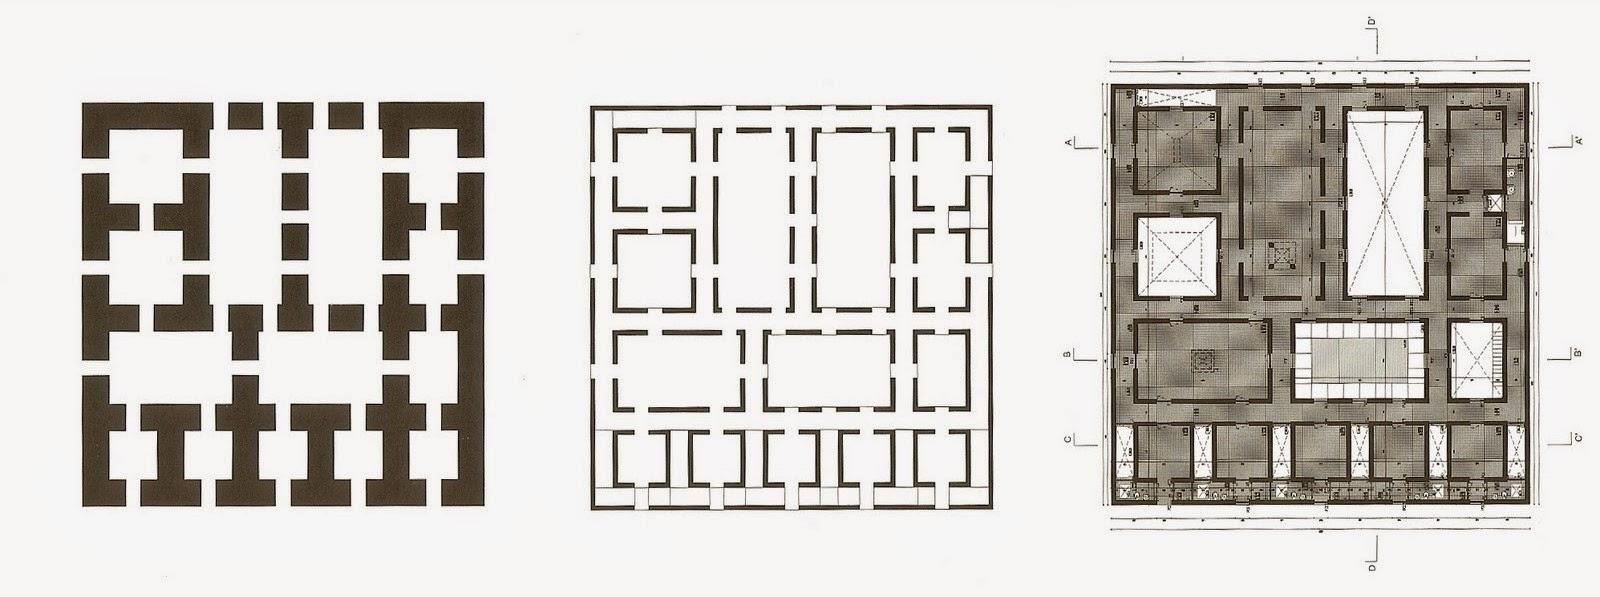 muros corredor camaras patios casa de alvalade aires mateus muros corredor camaras patios casa de alvalade aires mateus excavated and inhabited walls pinterest architecture